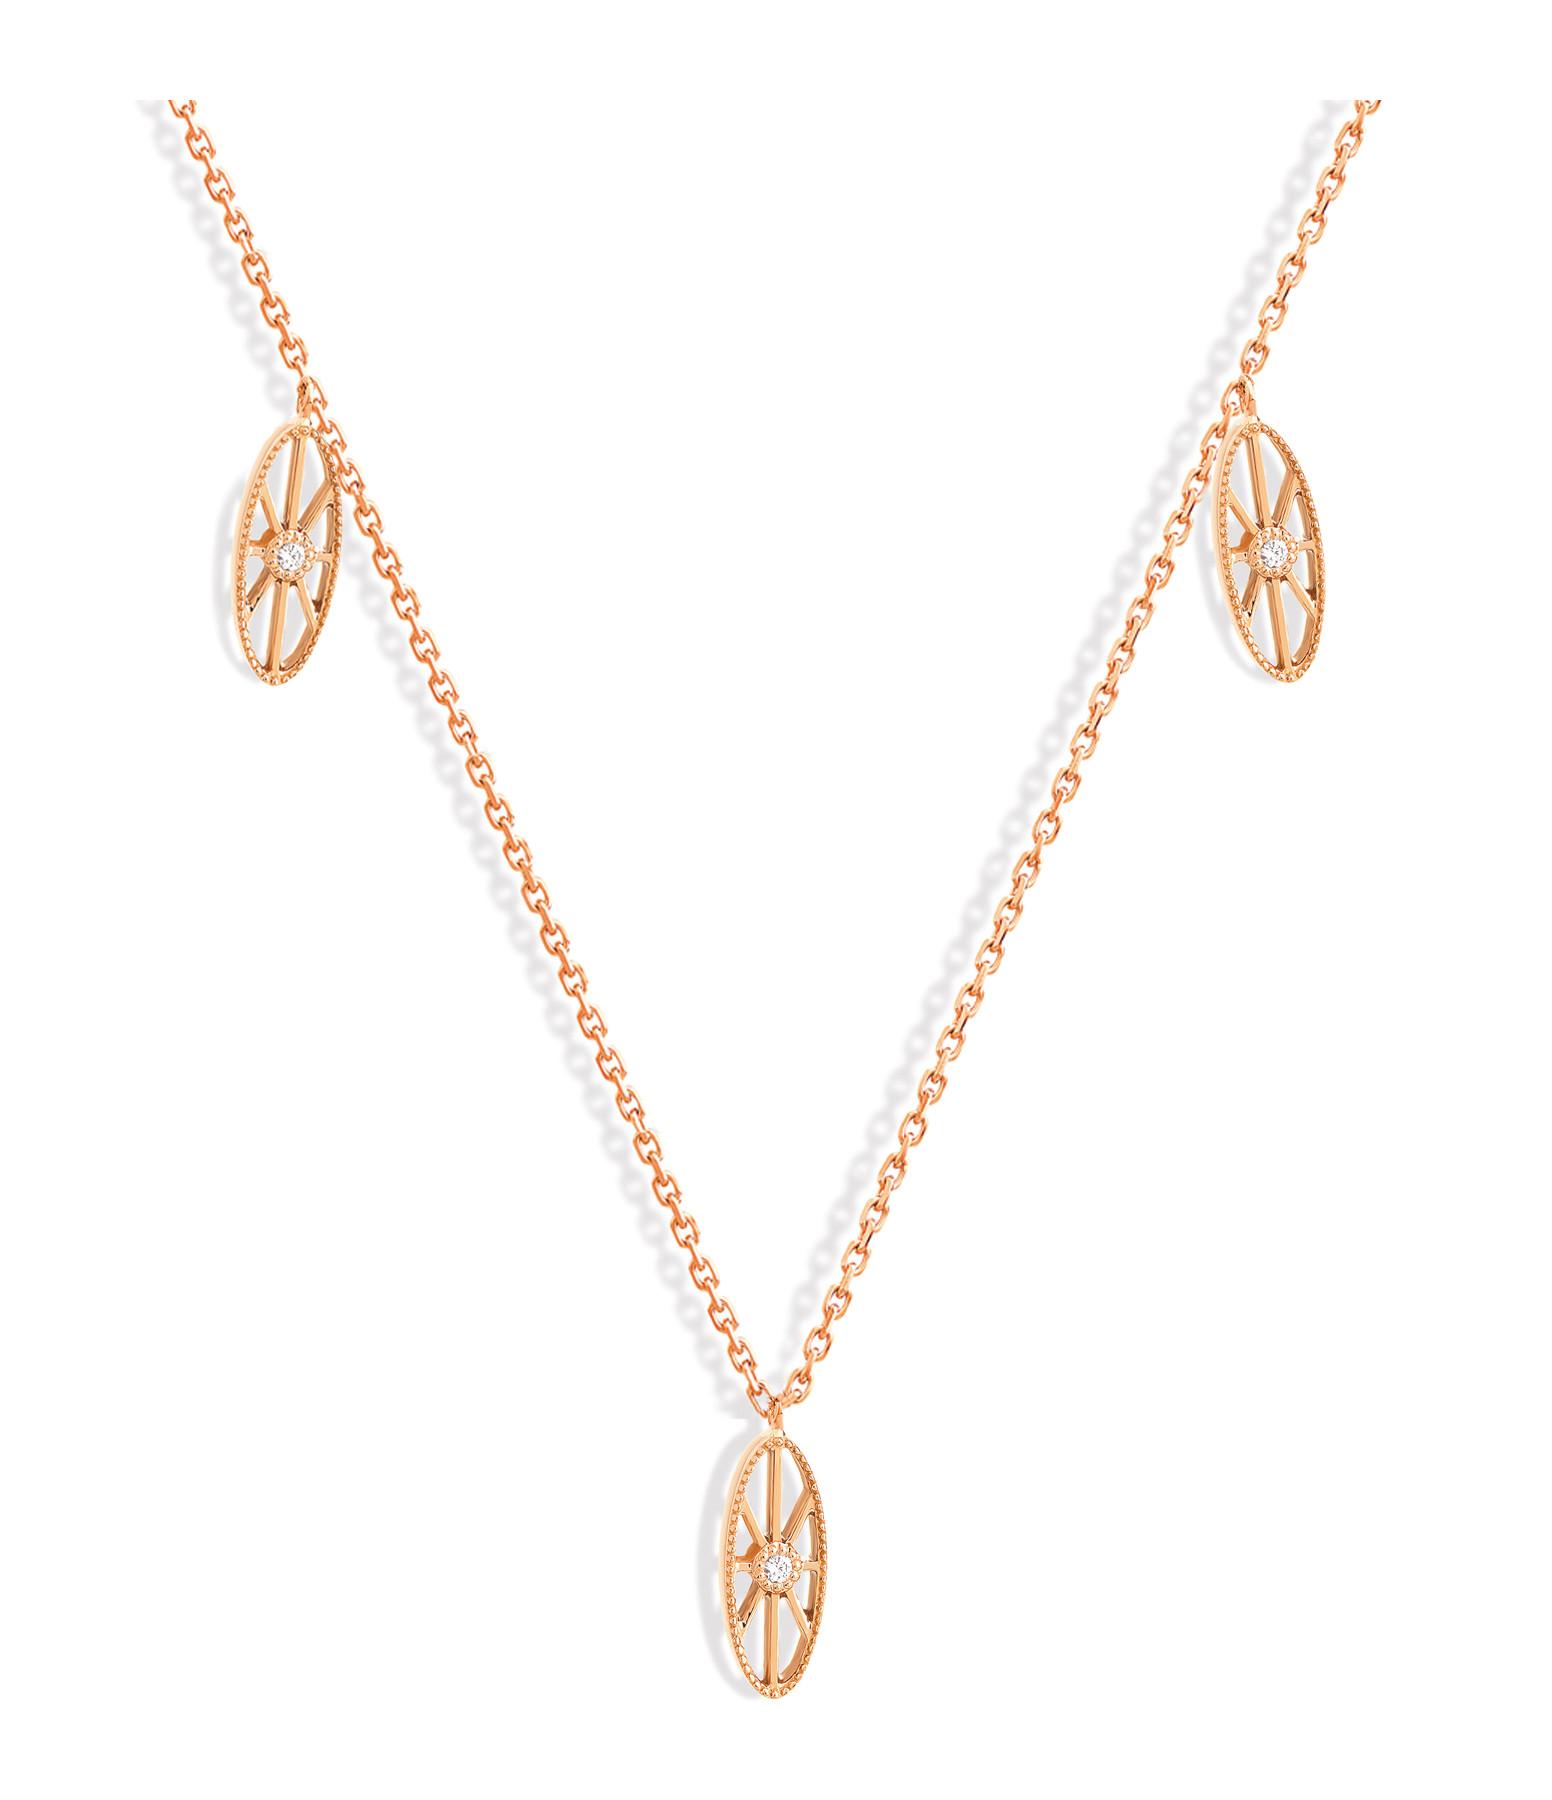 NAVA JOAILLERIE - Collier Cheyenne Mini-Ovale Diamants Or Rose